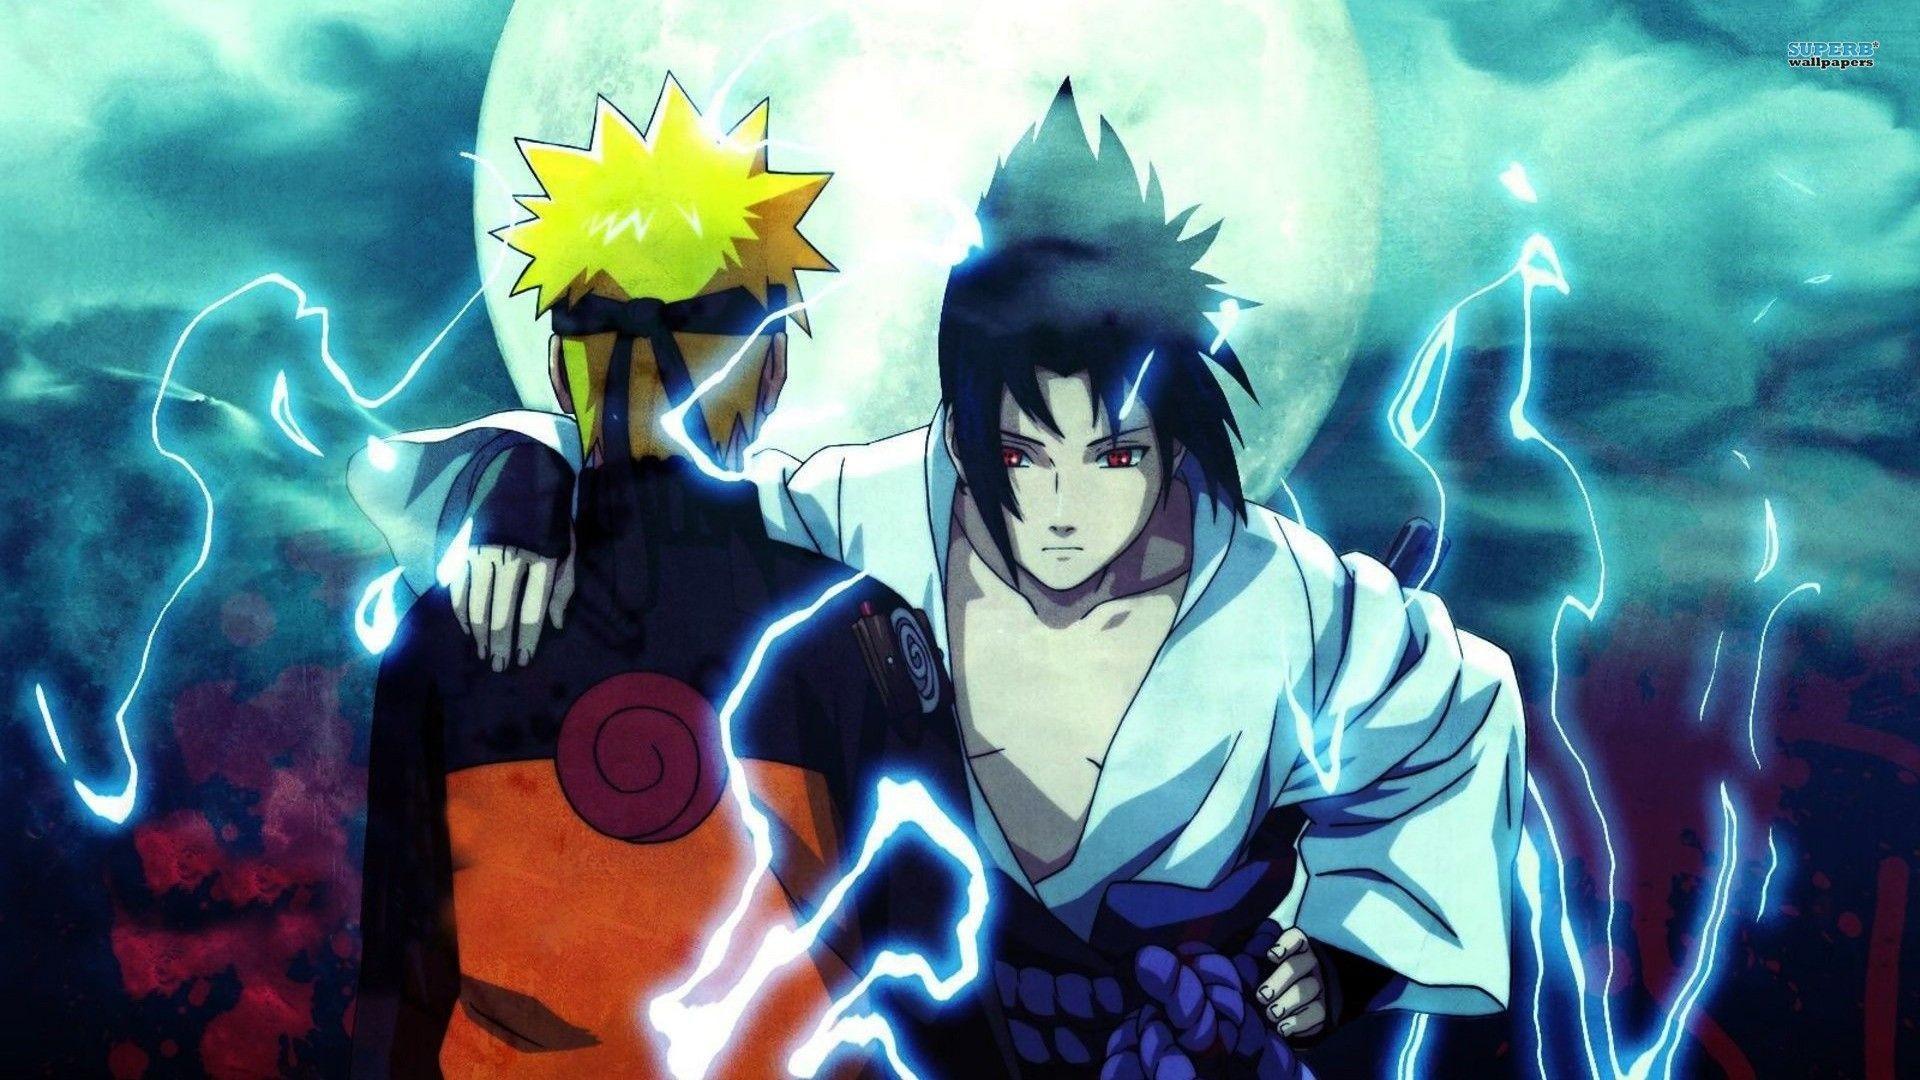 Sasuke And Naruto Wallpaper 59 Images